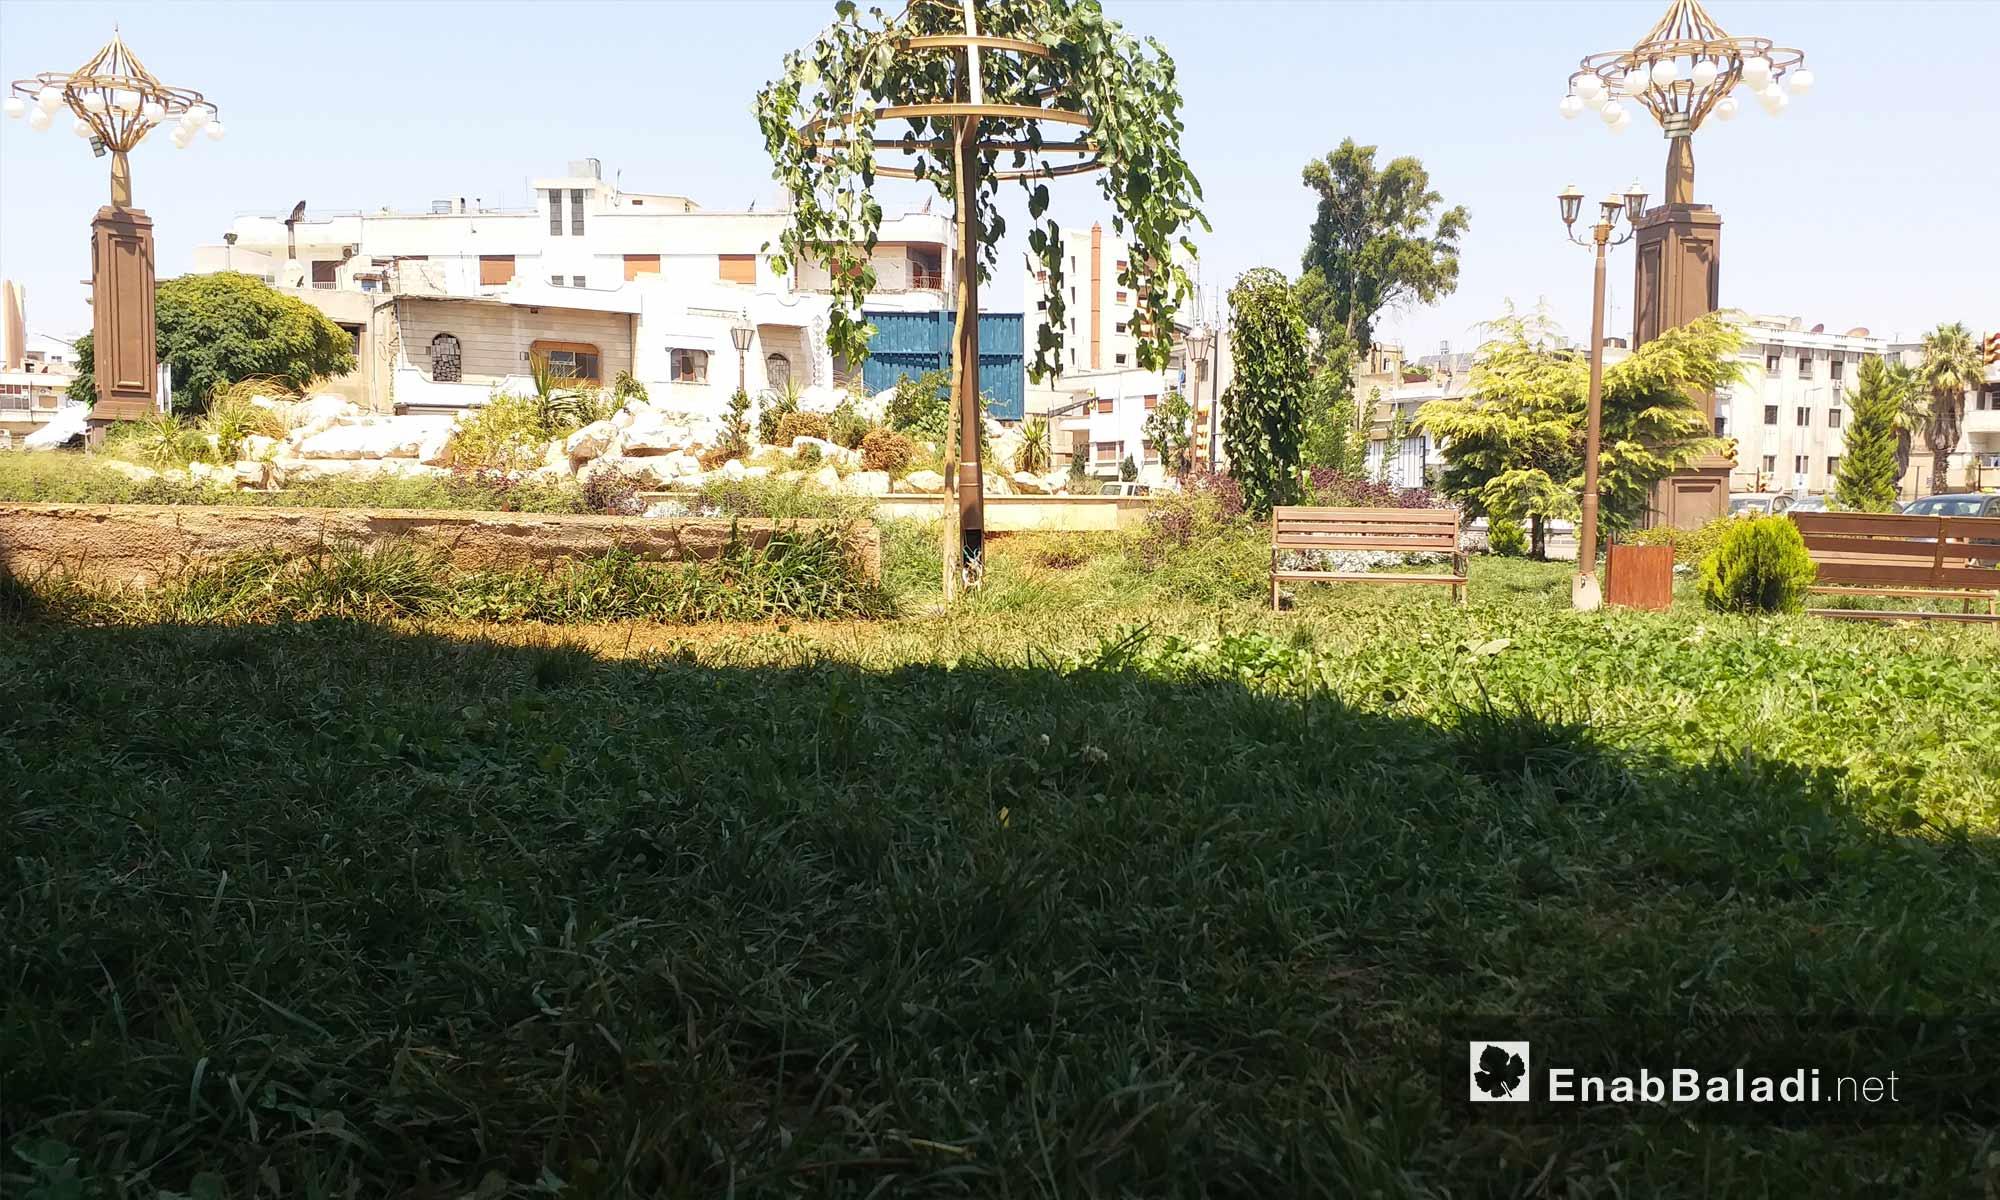 Al-Yasamin park in Dablan neighborhood, Homs city – August 19, 2018 (Enab Baladi)